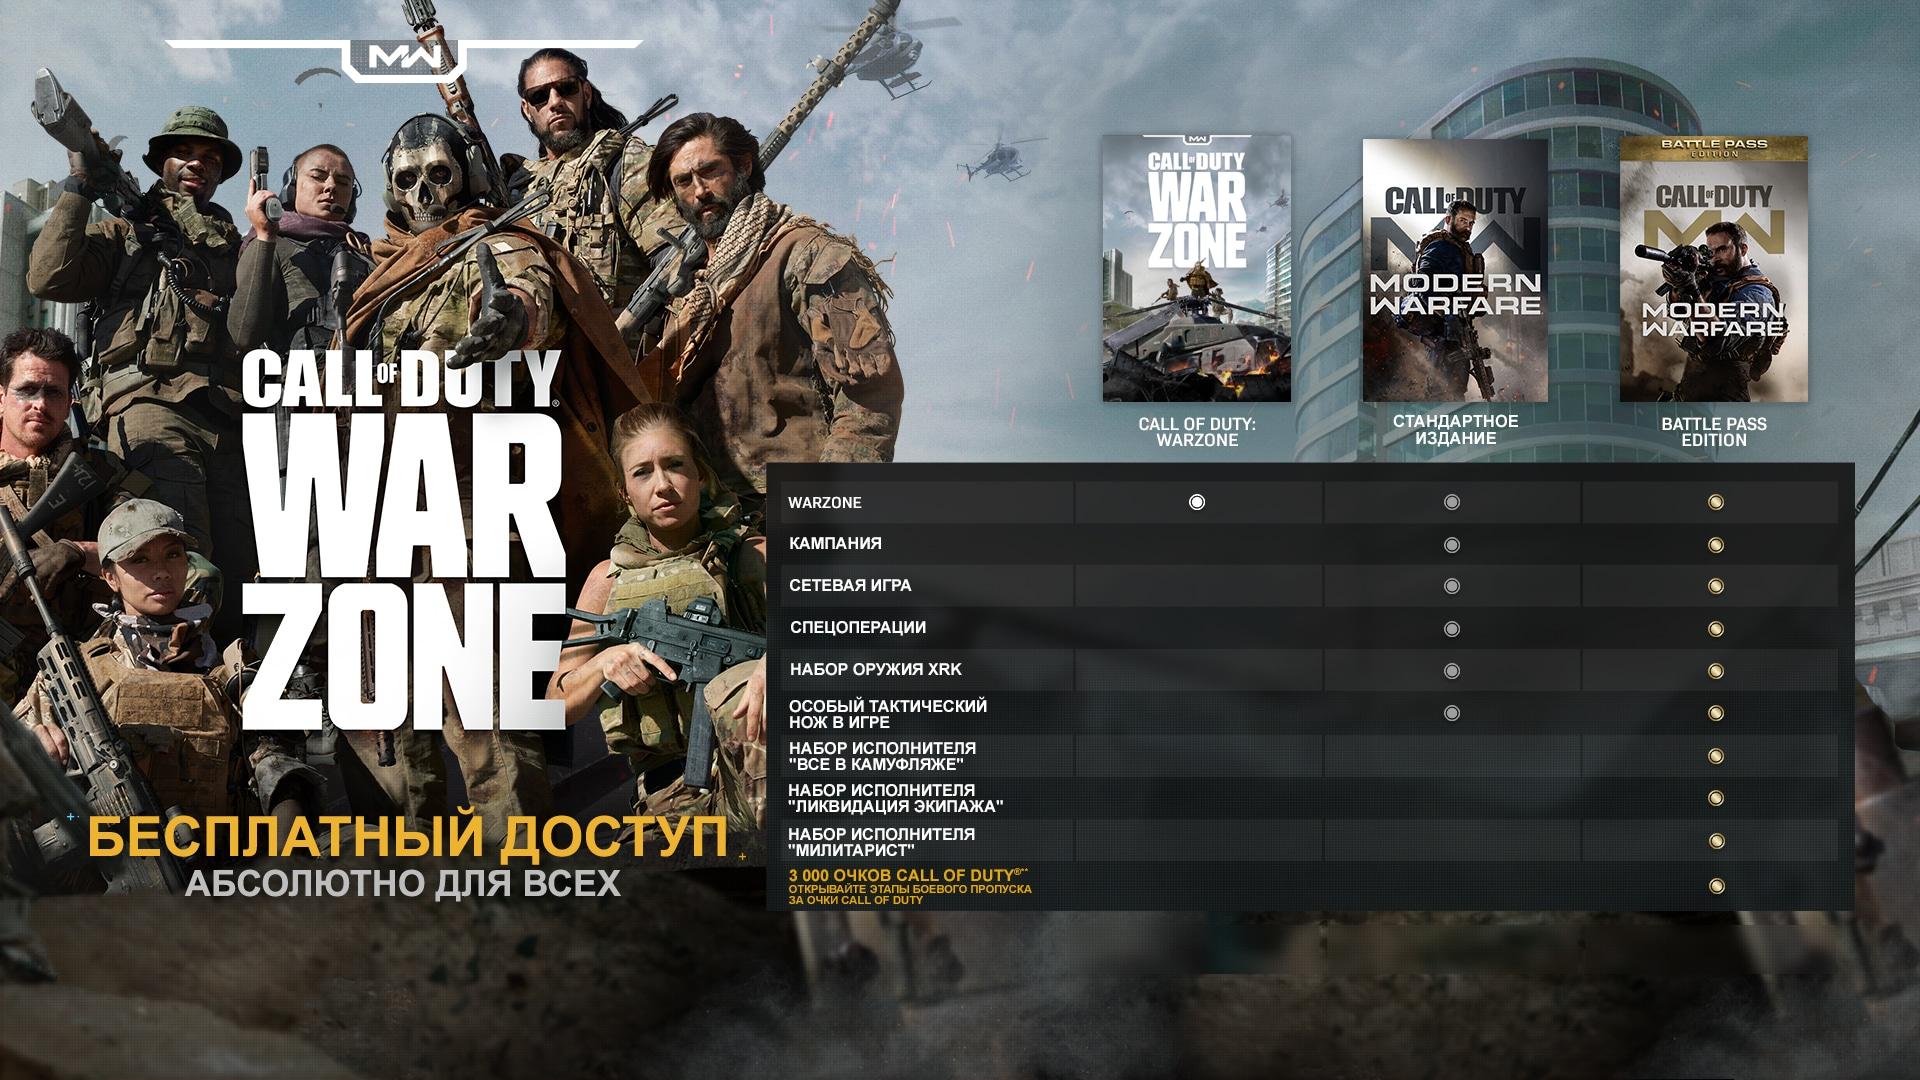 Сравнение изданий Call of Duty